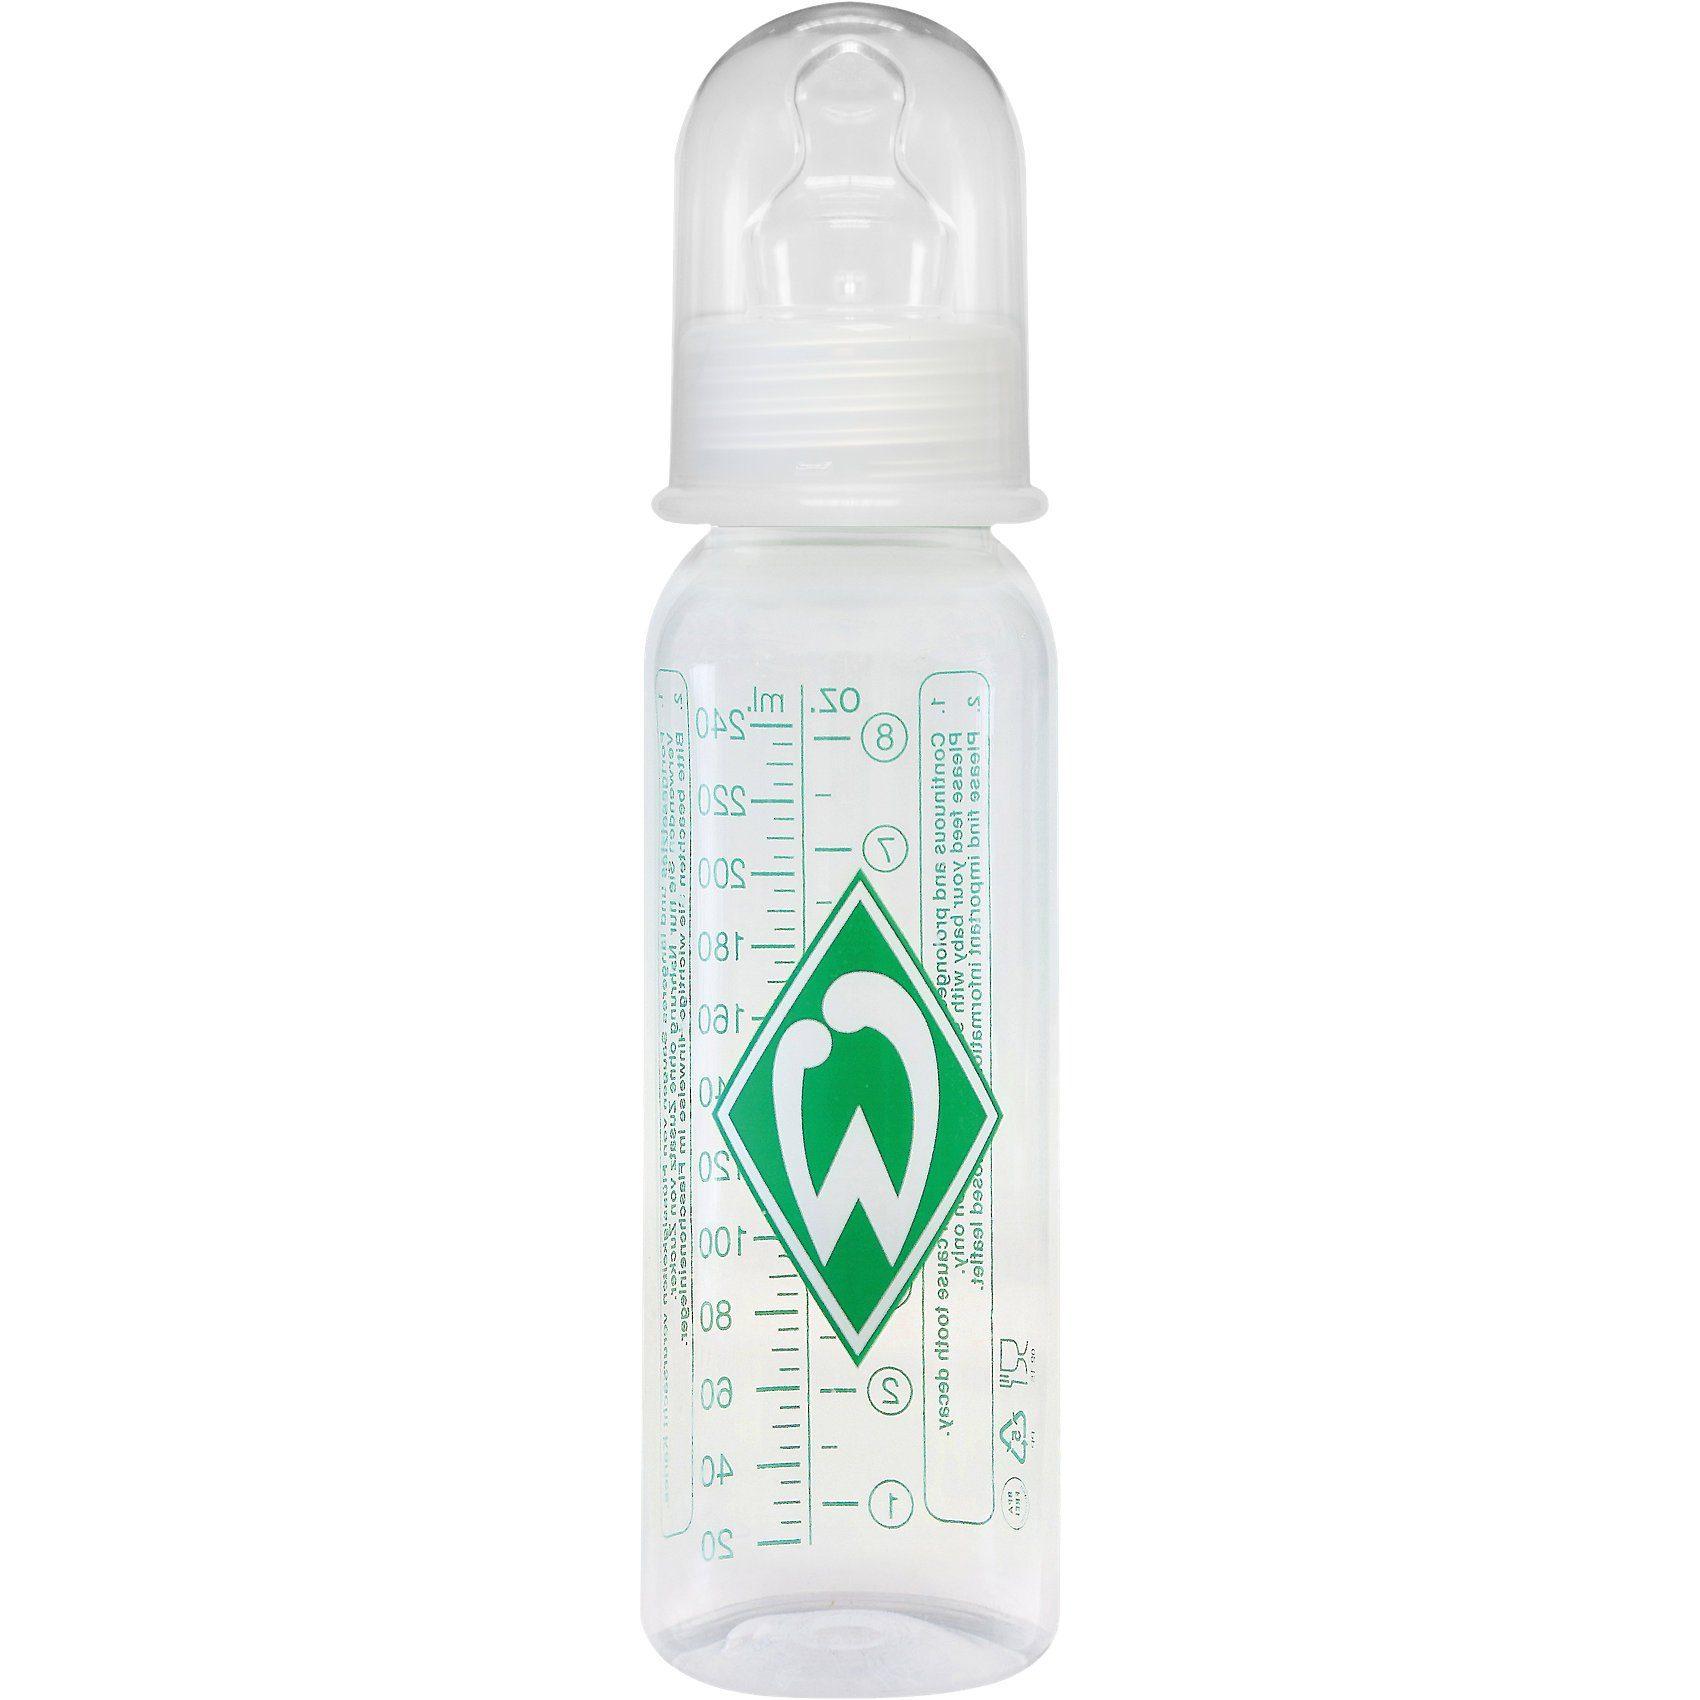 MAM Standard Flasche, PP, 250 ml, Silikonsauger, SV Werder Breme